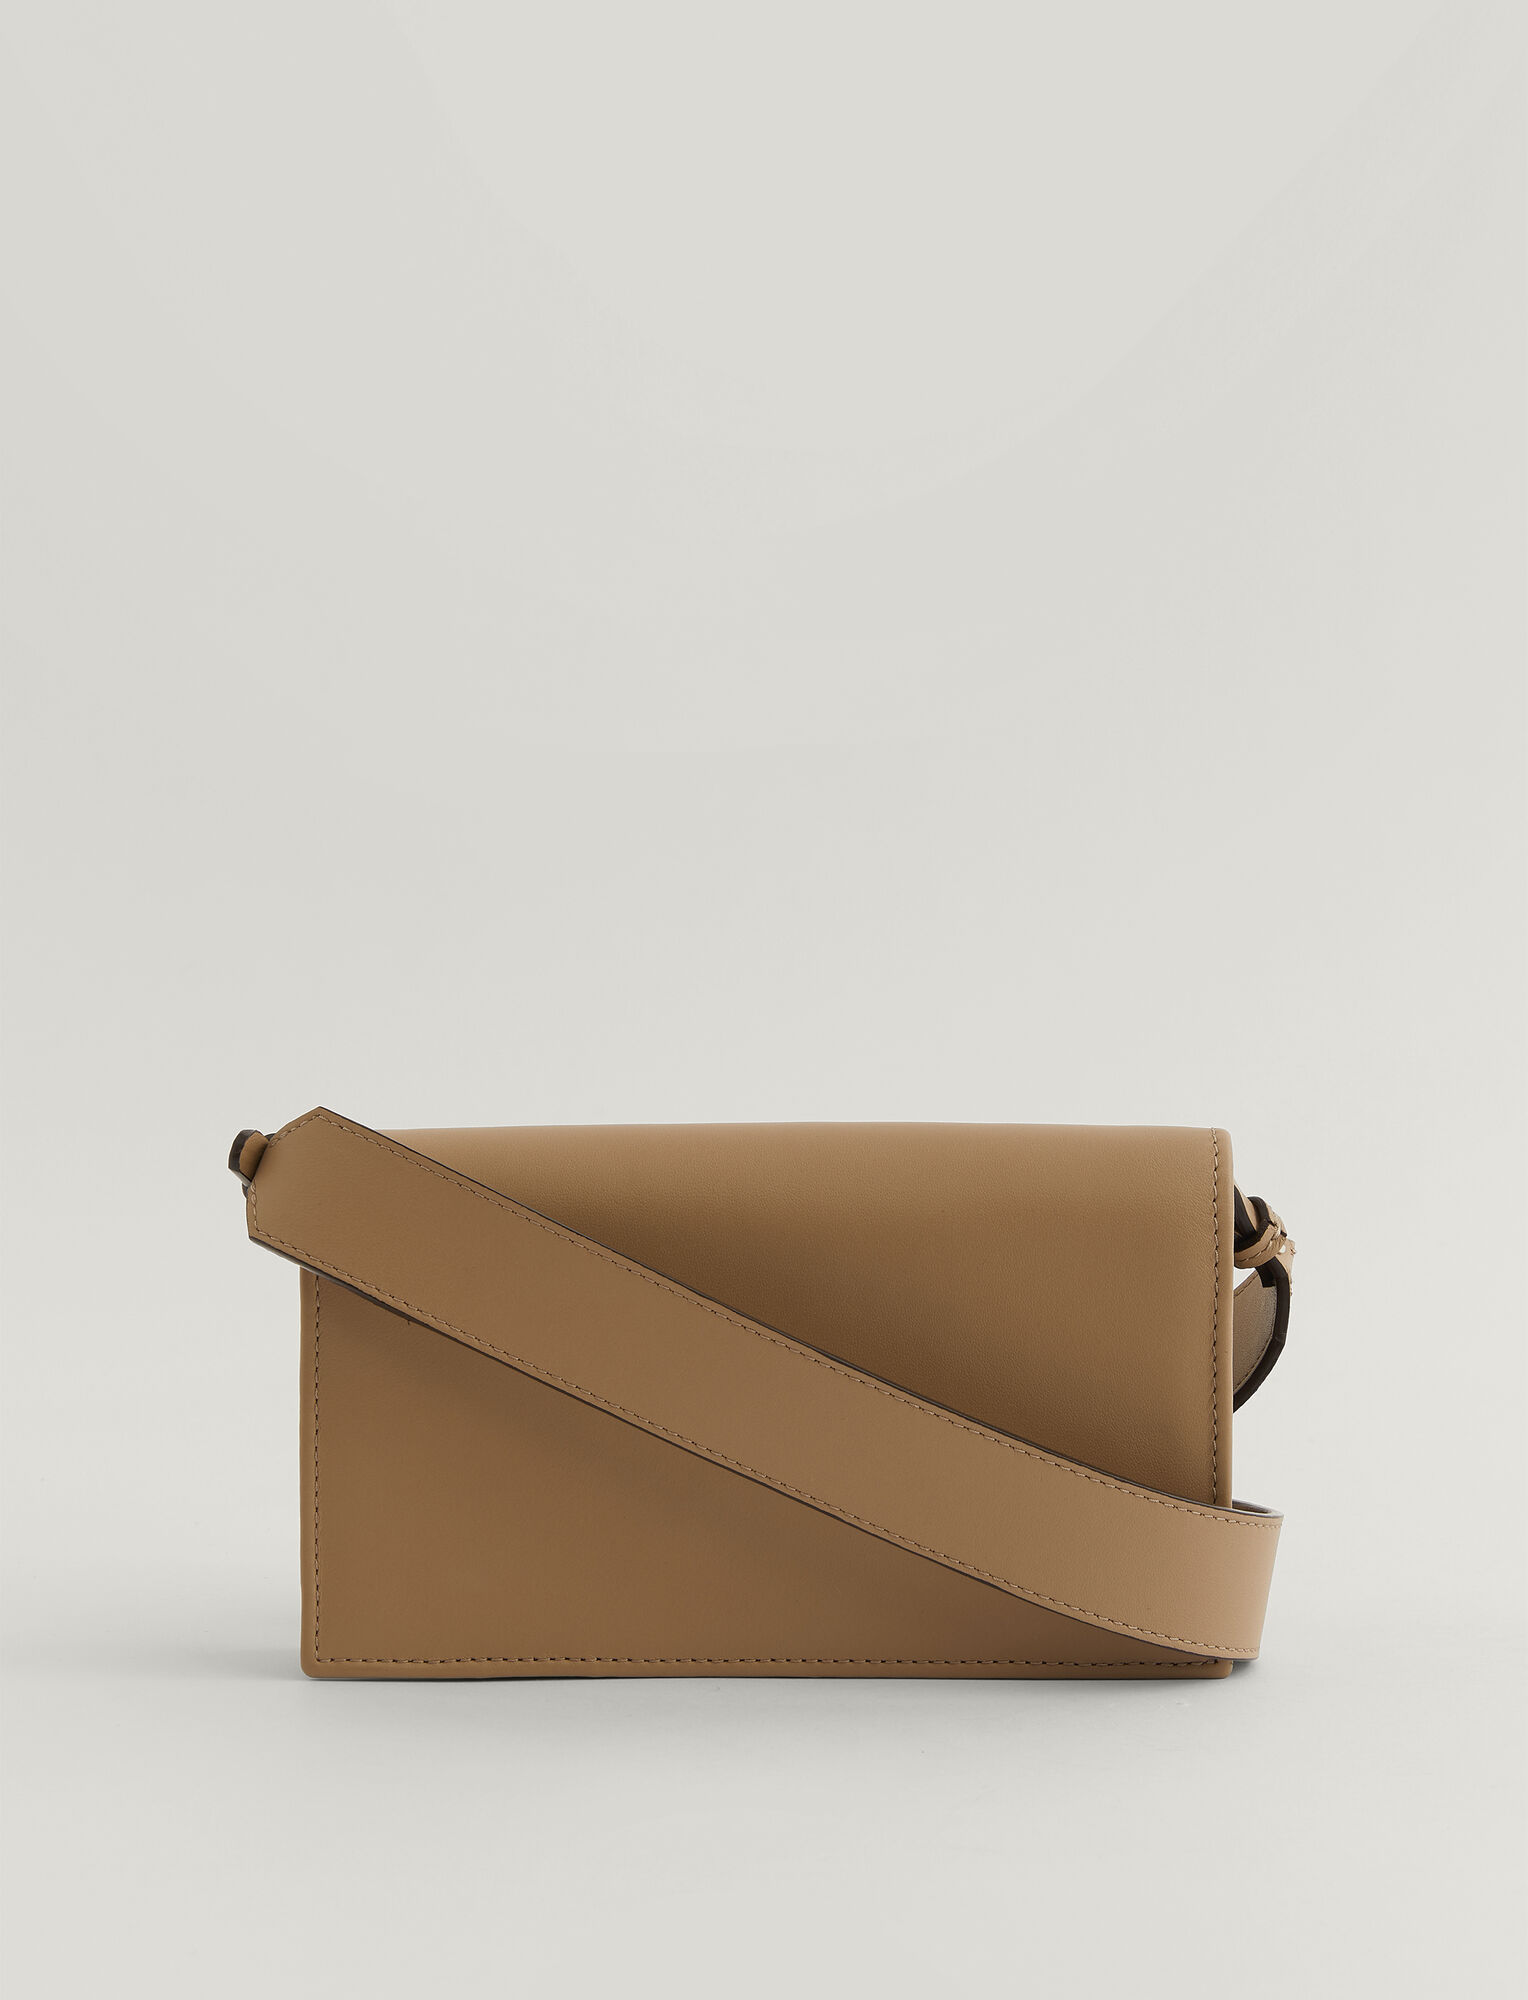 Joseph, Cozumel Light Shoulder Wallet, in SIROCCO